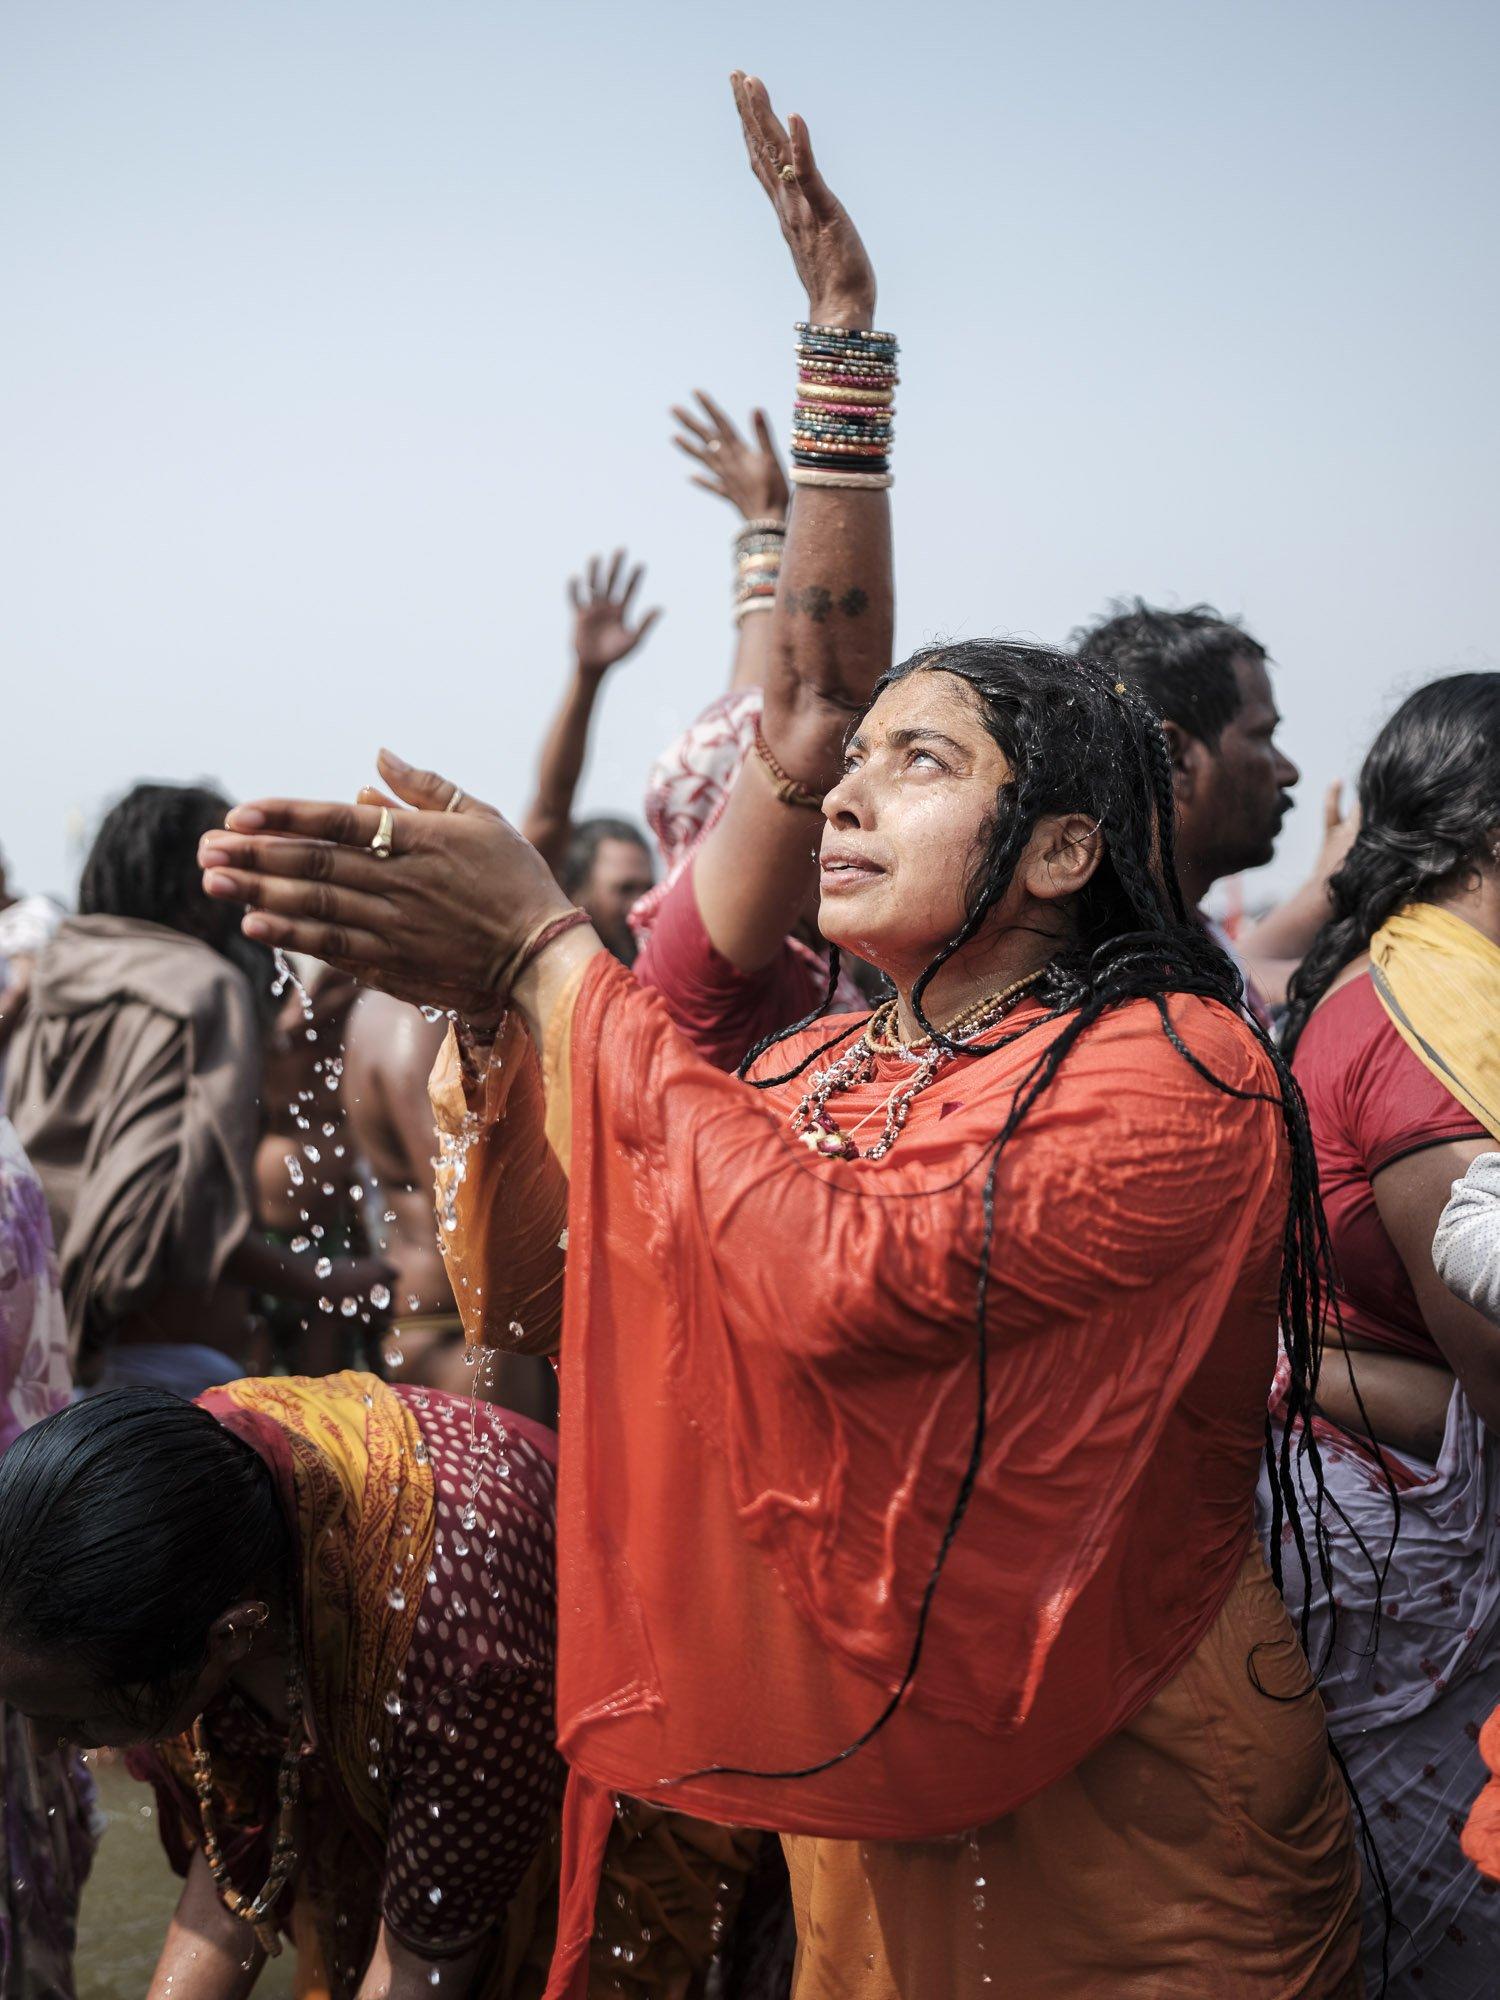 woman prayer in the water pilgrims Kumbh mela 2019 India Allahabad Prayagraj Ardh hindu religious Festival event rivers photographer jose jeuland photography